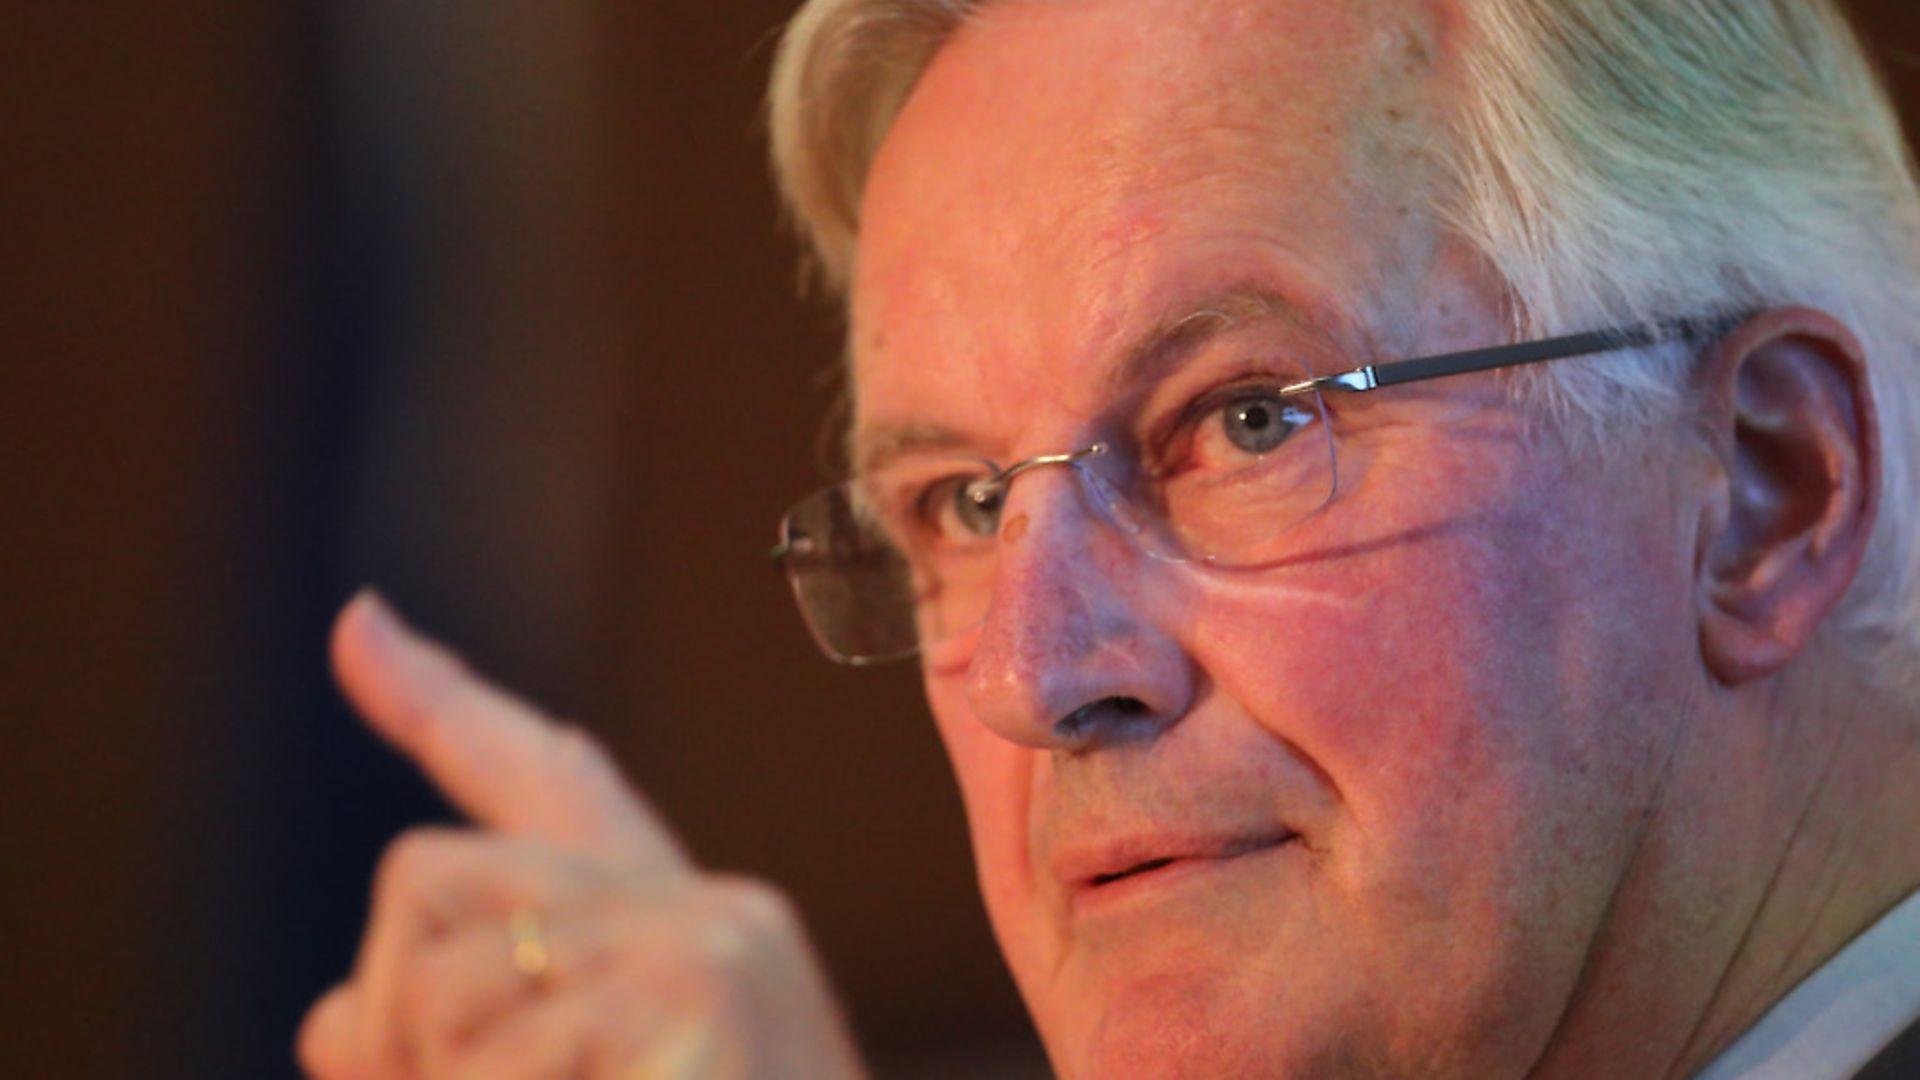 Michel Barnier, the EU's Brexit negotiator, speaking at Queen's University in Belfast. Photograph: Liam McBurney/PA. - Credit: PA